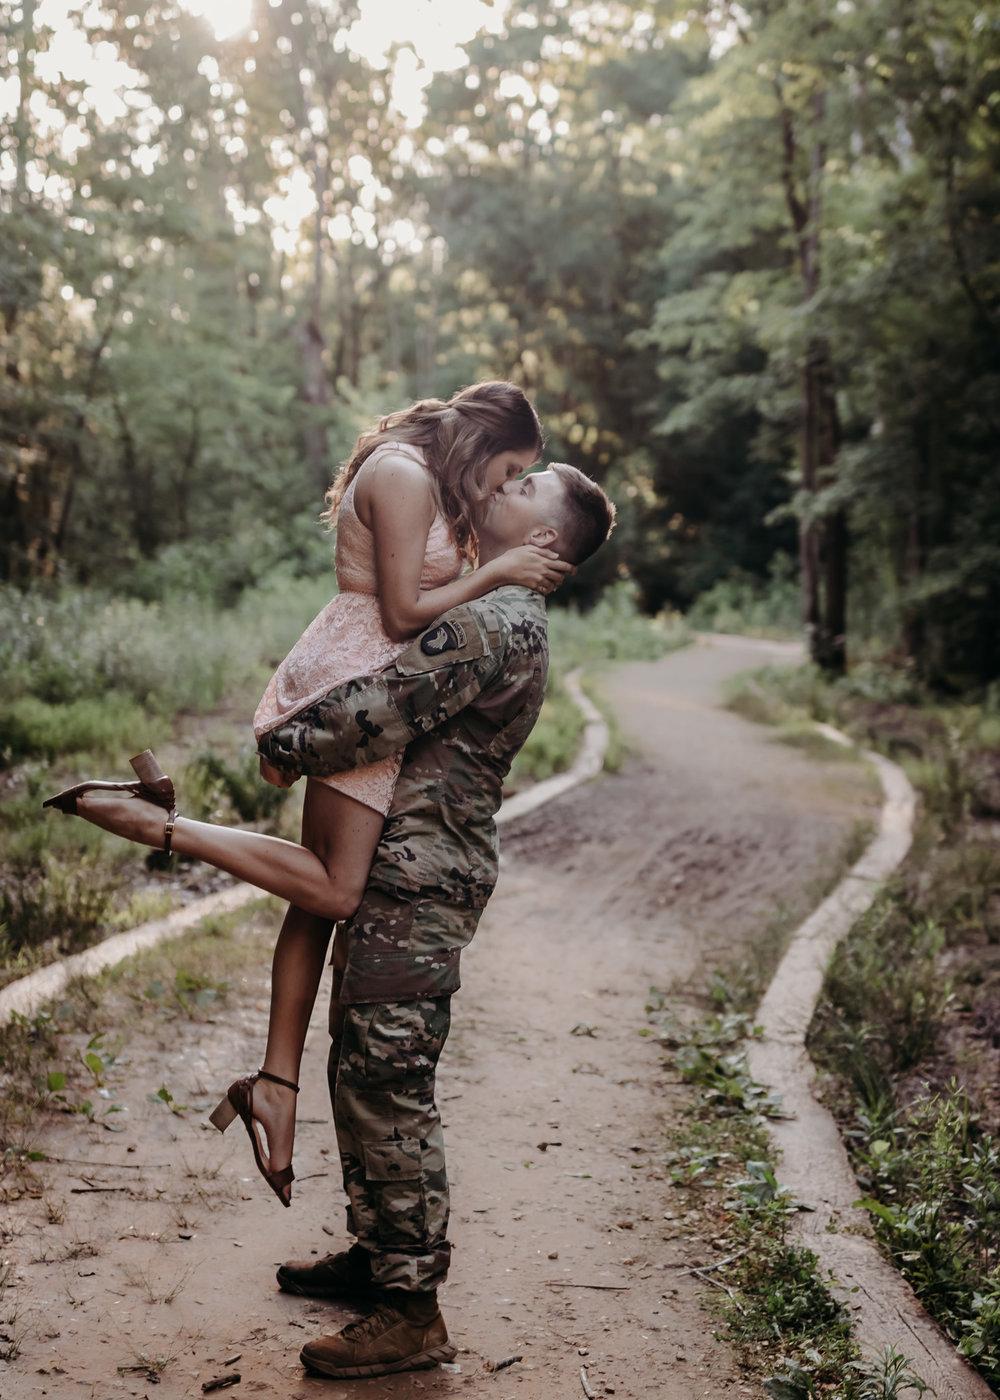 man in uniform raising girl up kissing